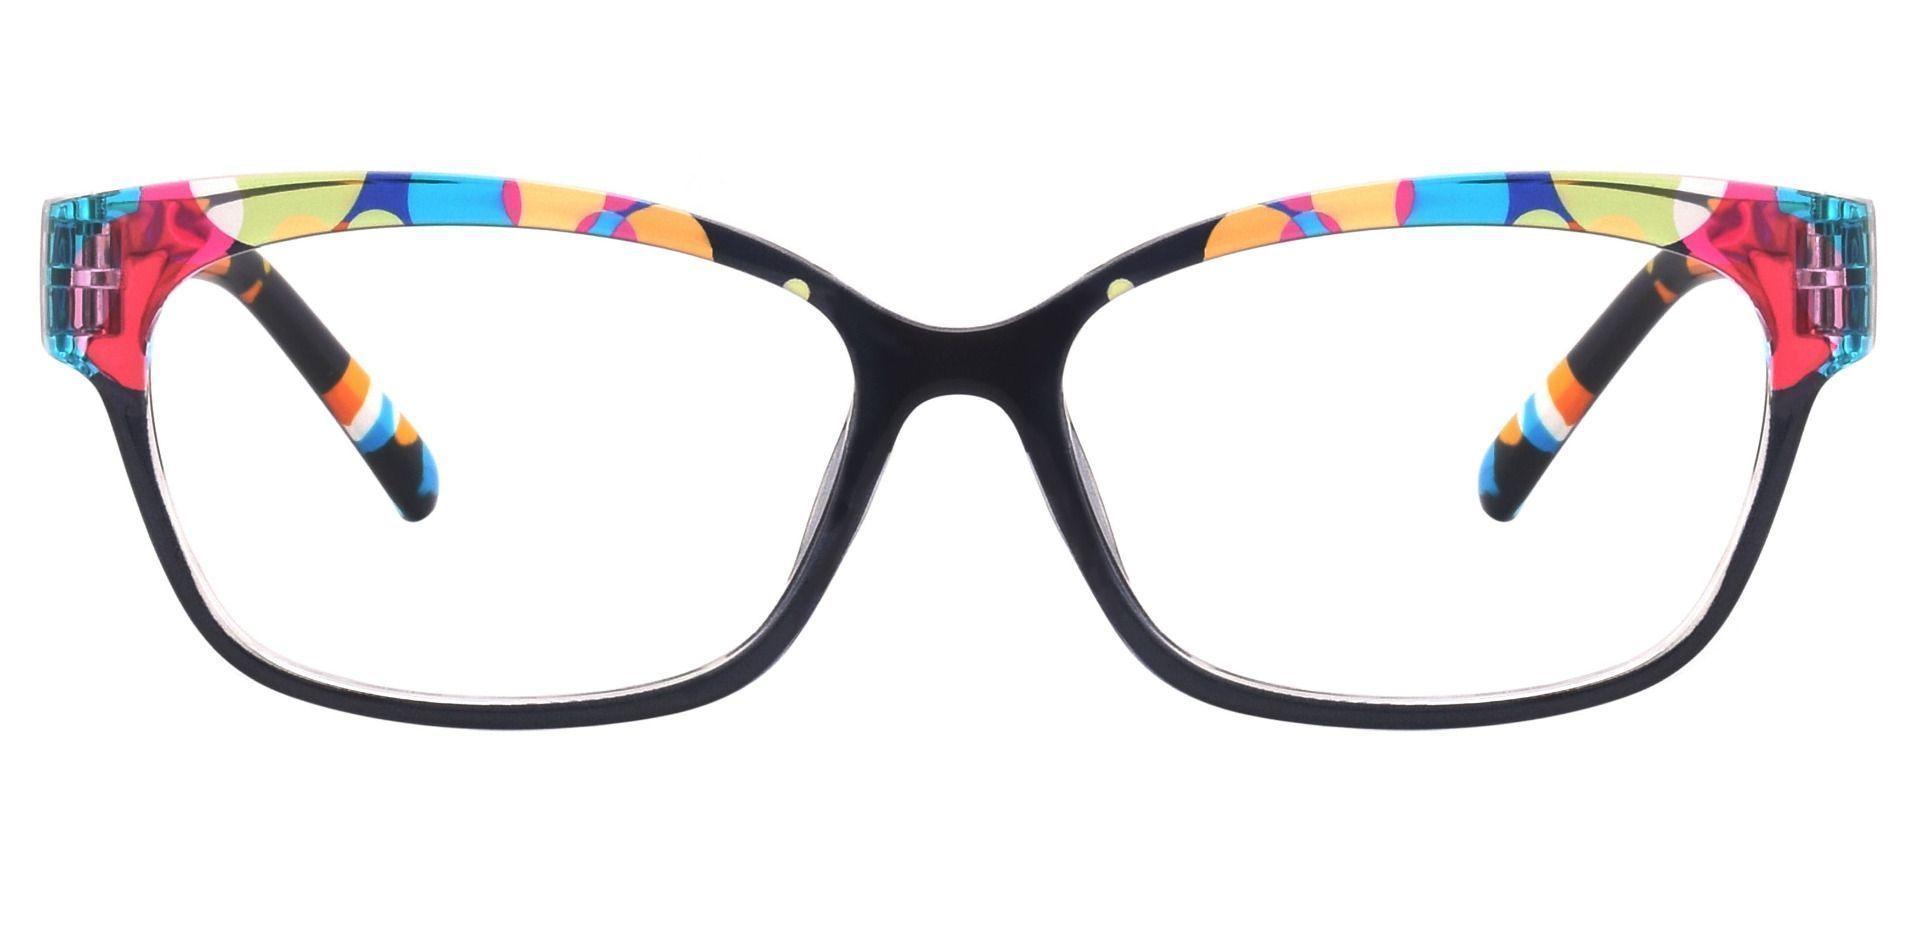 Adele Cat-Eye Prescription Glasses - Multi Color